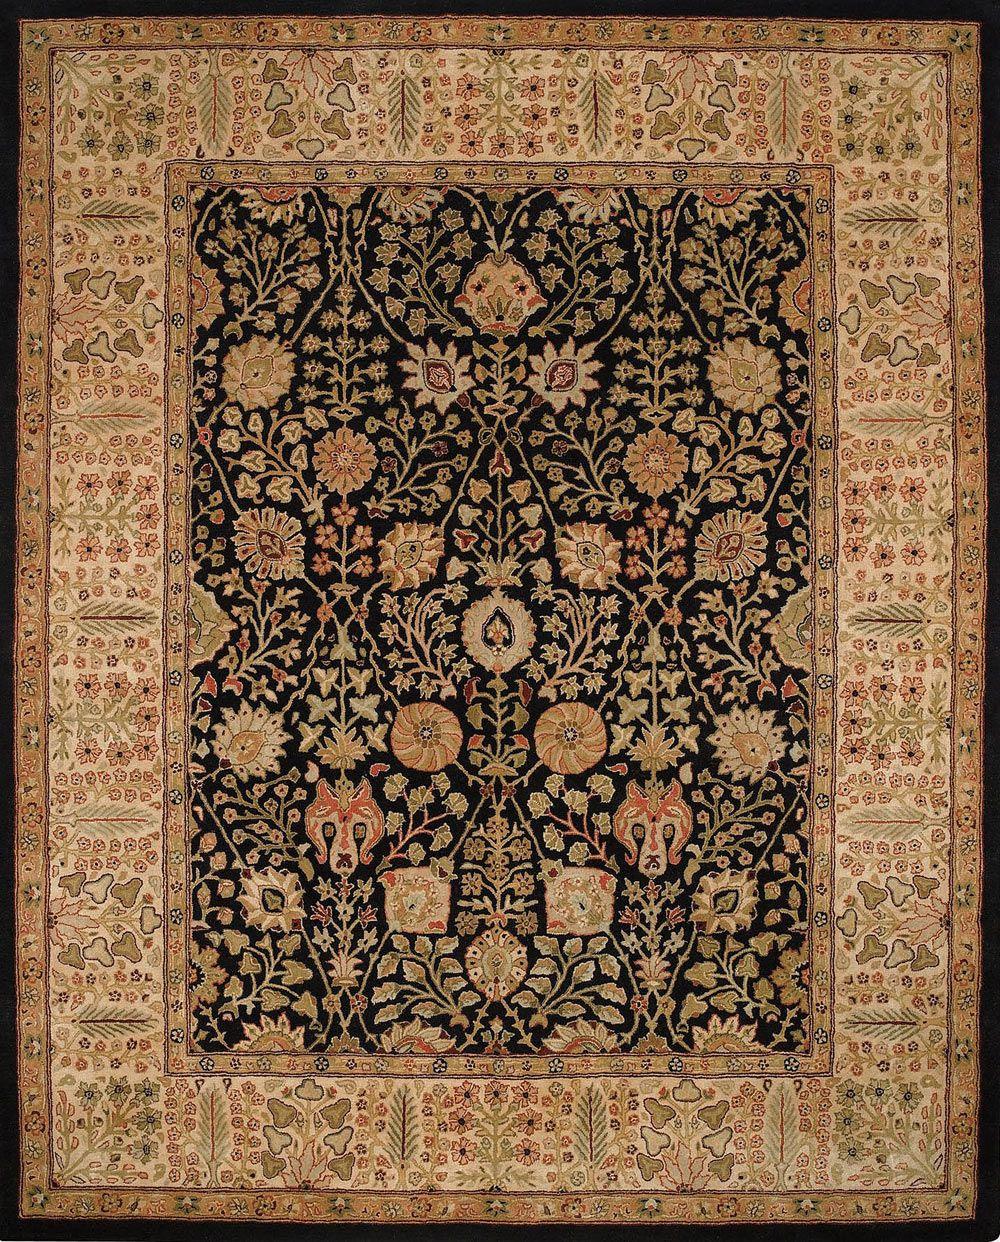 9292 350 Black Carpets Rugs Floral Area Rugs Carpet